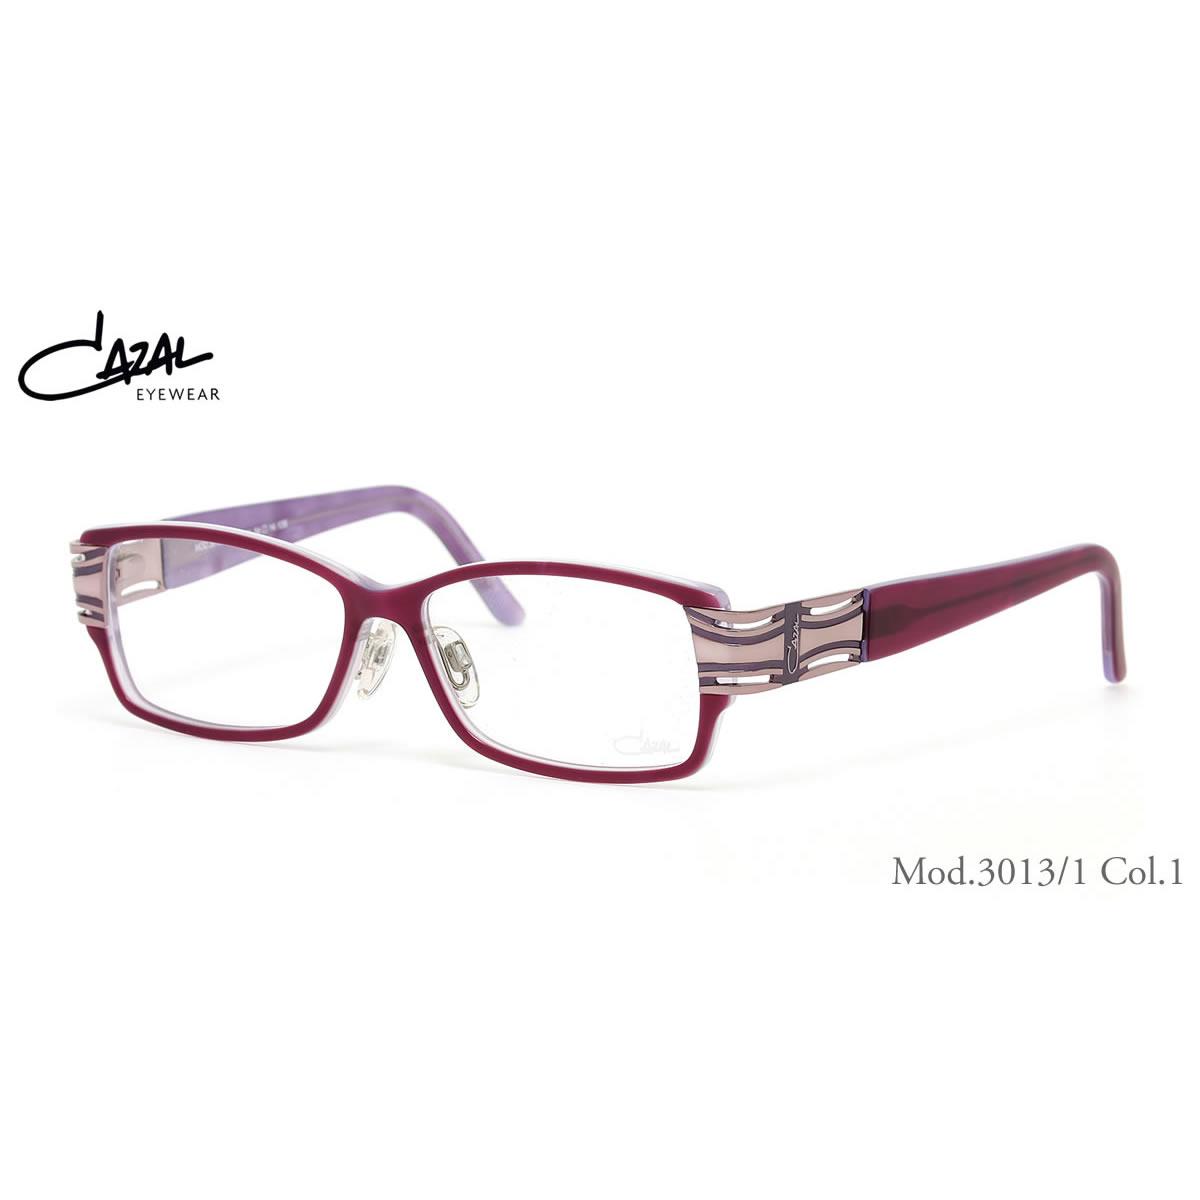 CAZAL カザール メガネ 3013/1 001 54サイズ CAZAL 伊達メガネレンズ無料 メンズ レディース